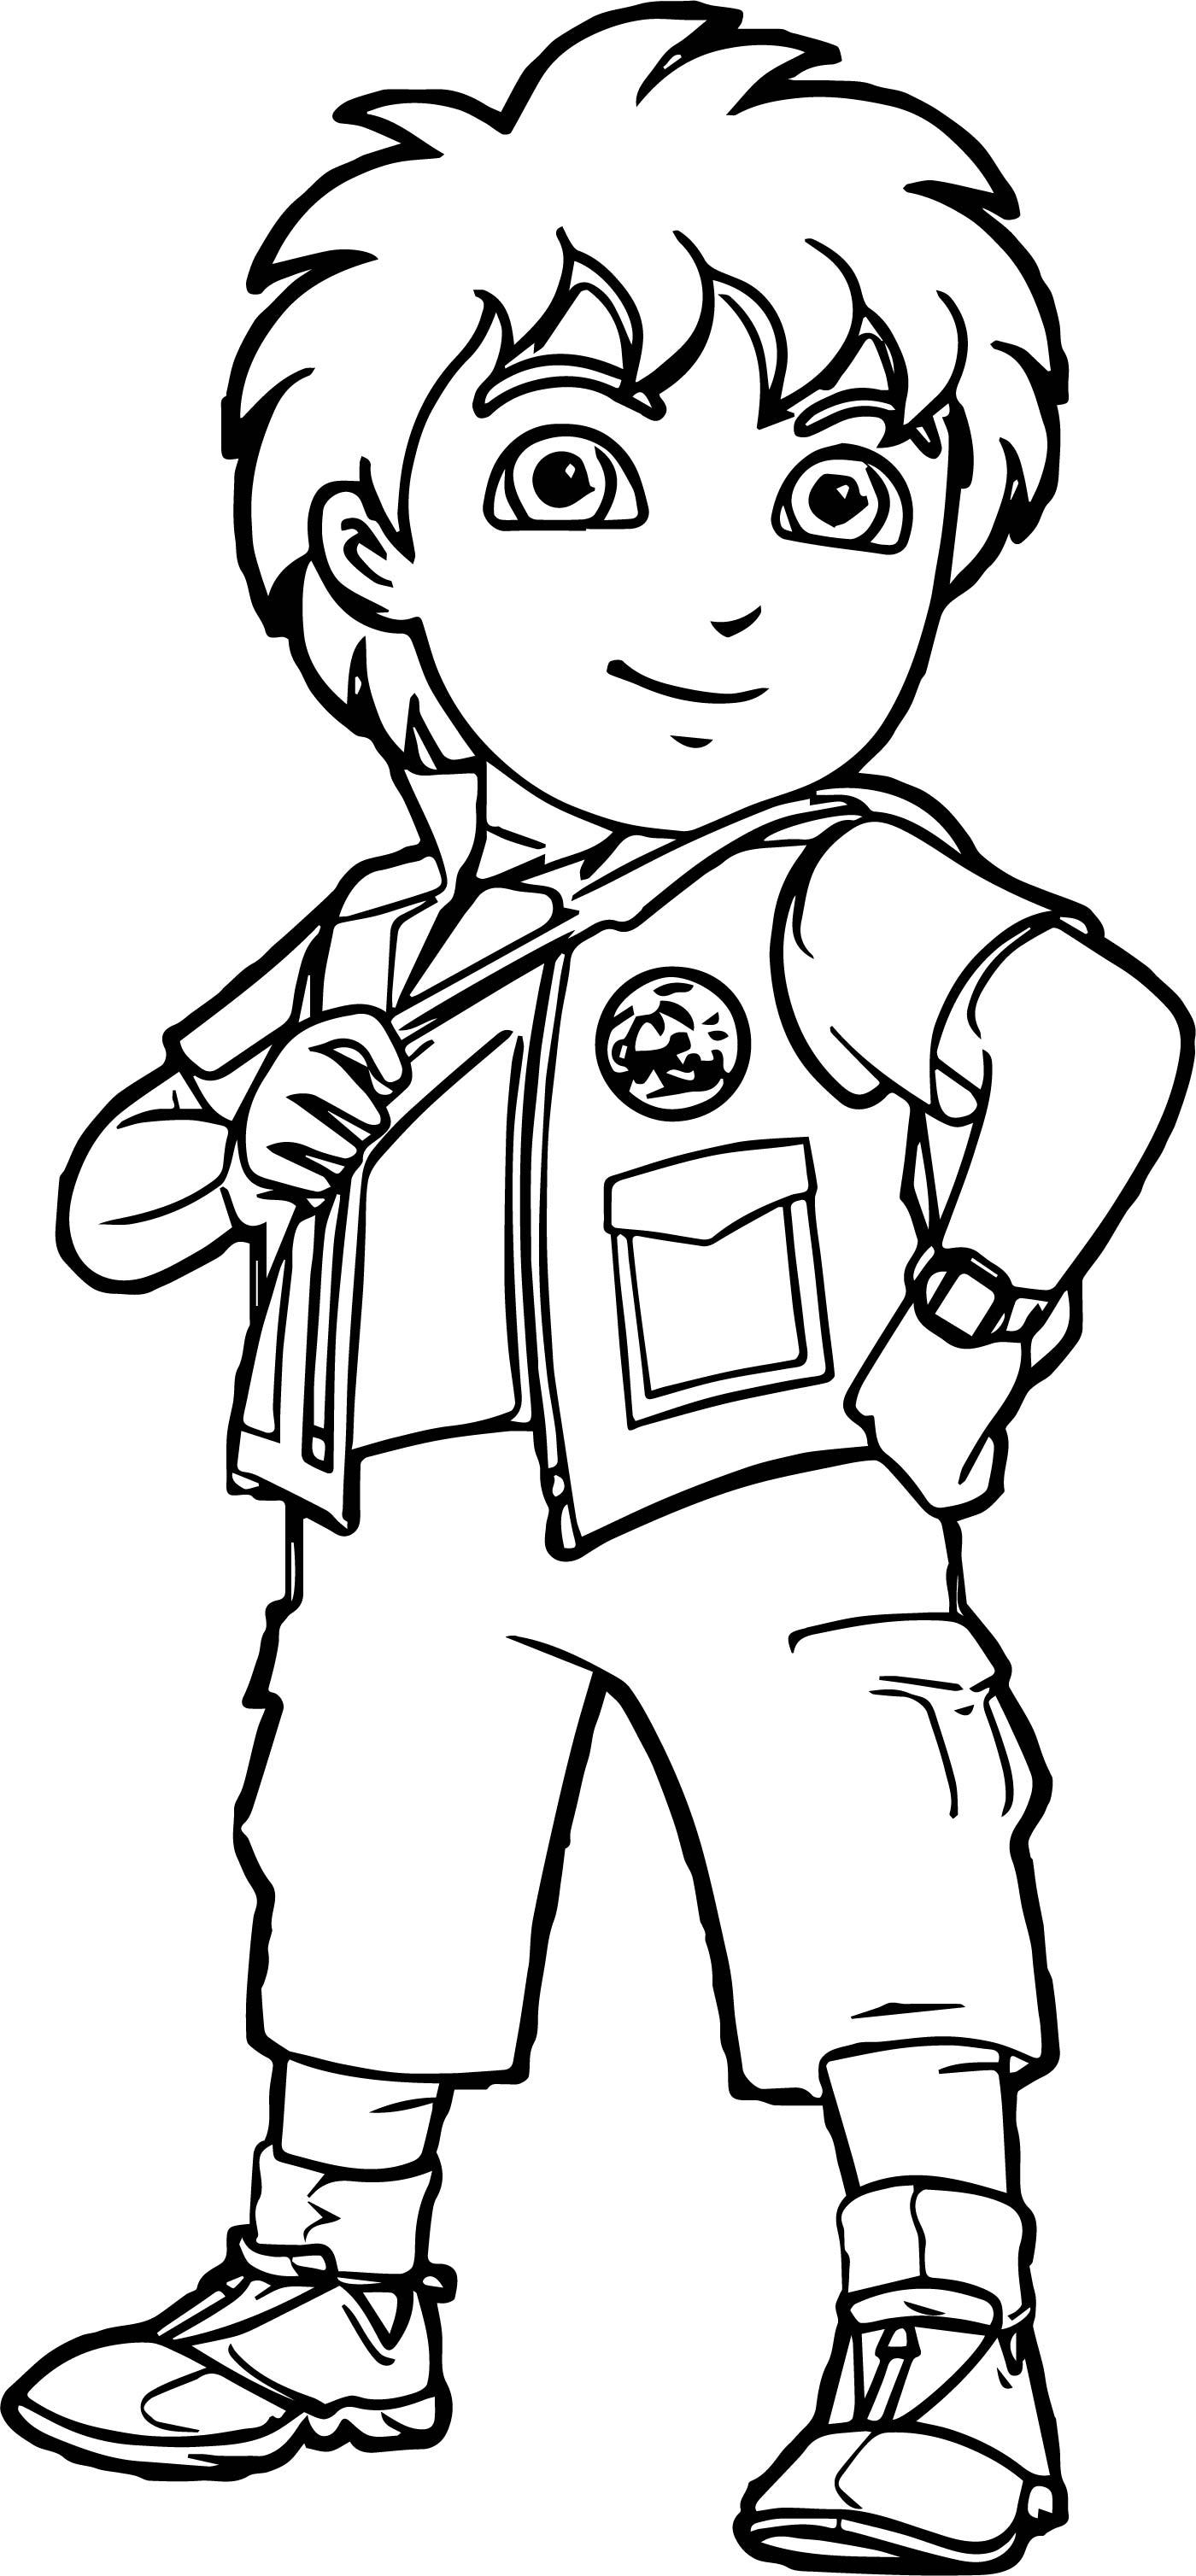 Go Diego Go Boy Pose Coloring Page